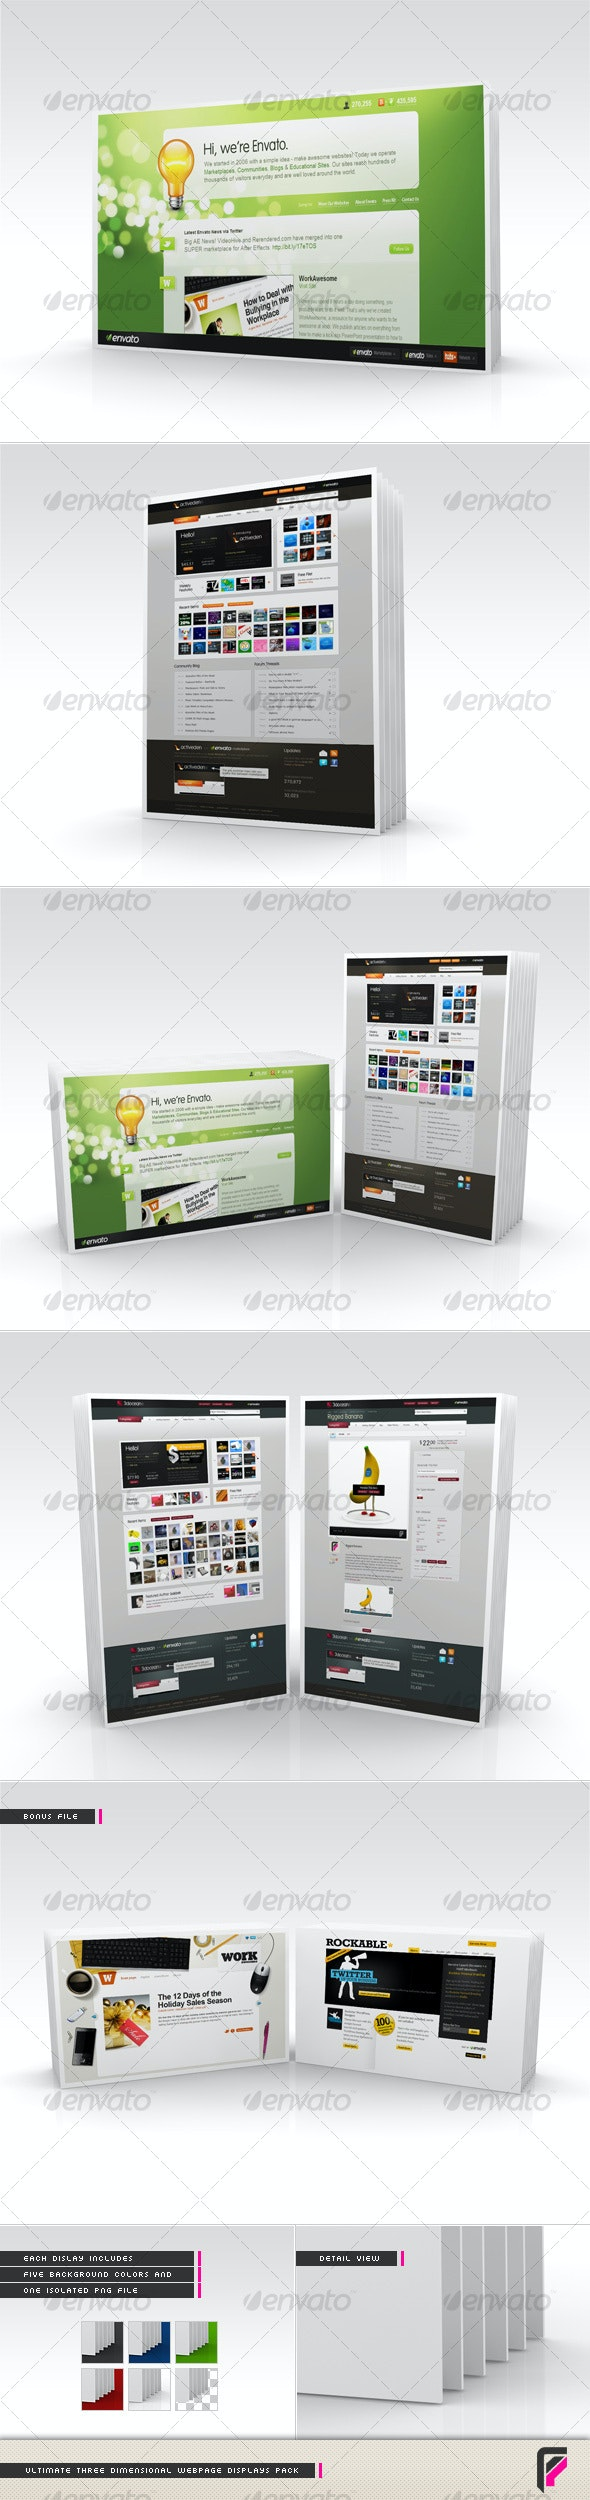 Ultimate 3D Webpage Displays Pack - Web Elements